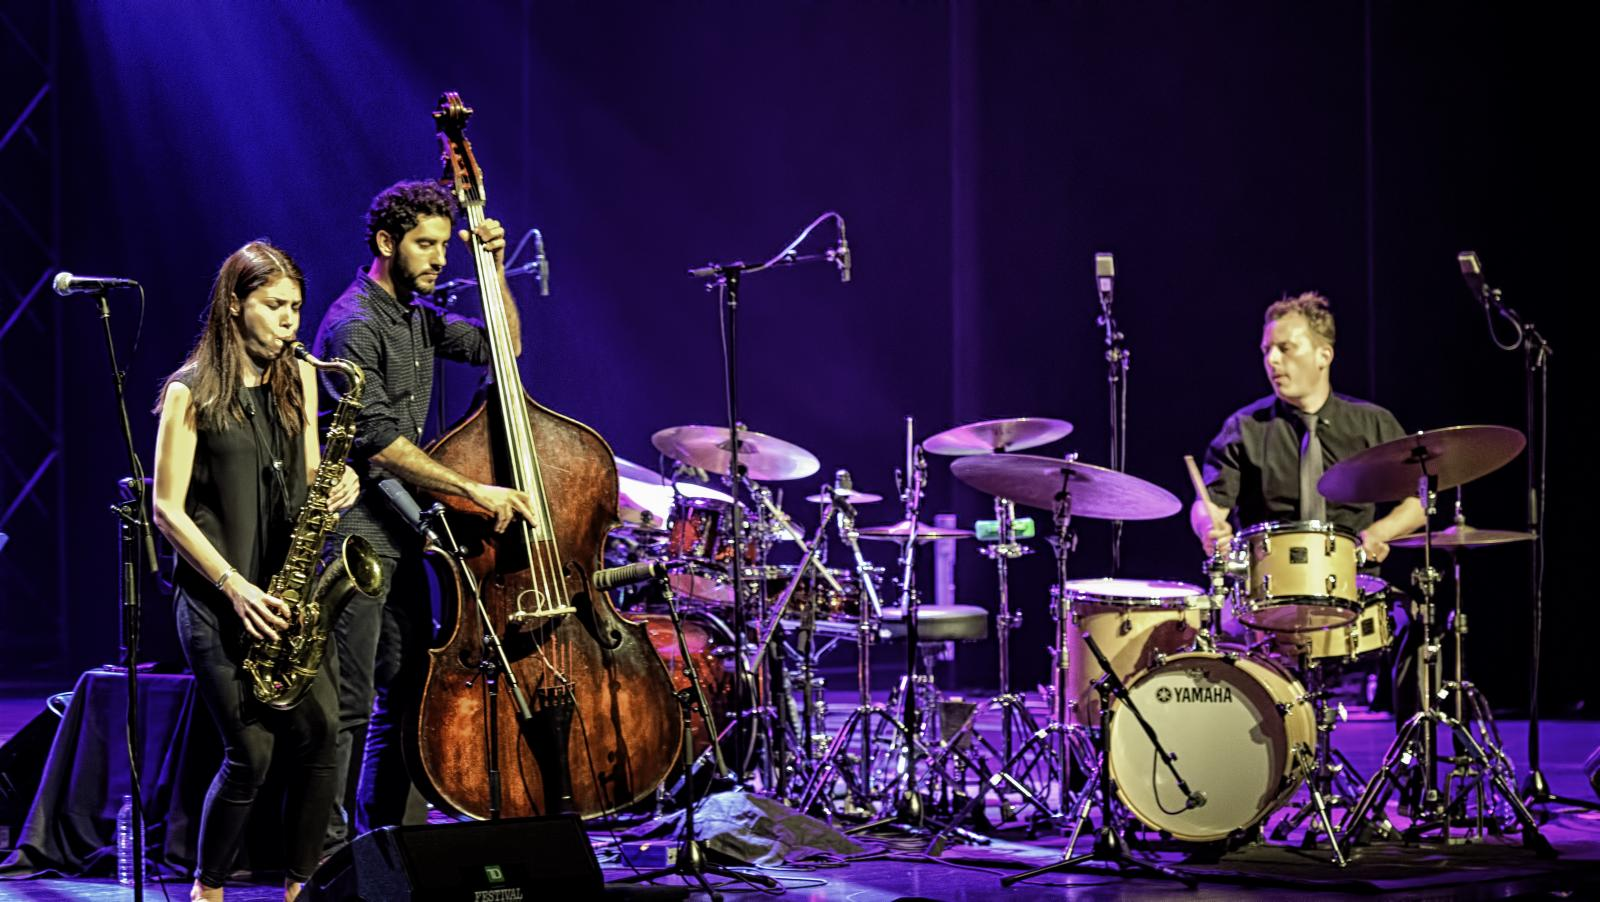 Melissa Aldana, Pablo Menares and Jochen Rueckert at the Montreal International Jazz Festival 2016